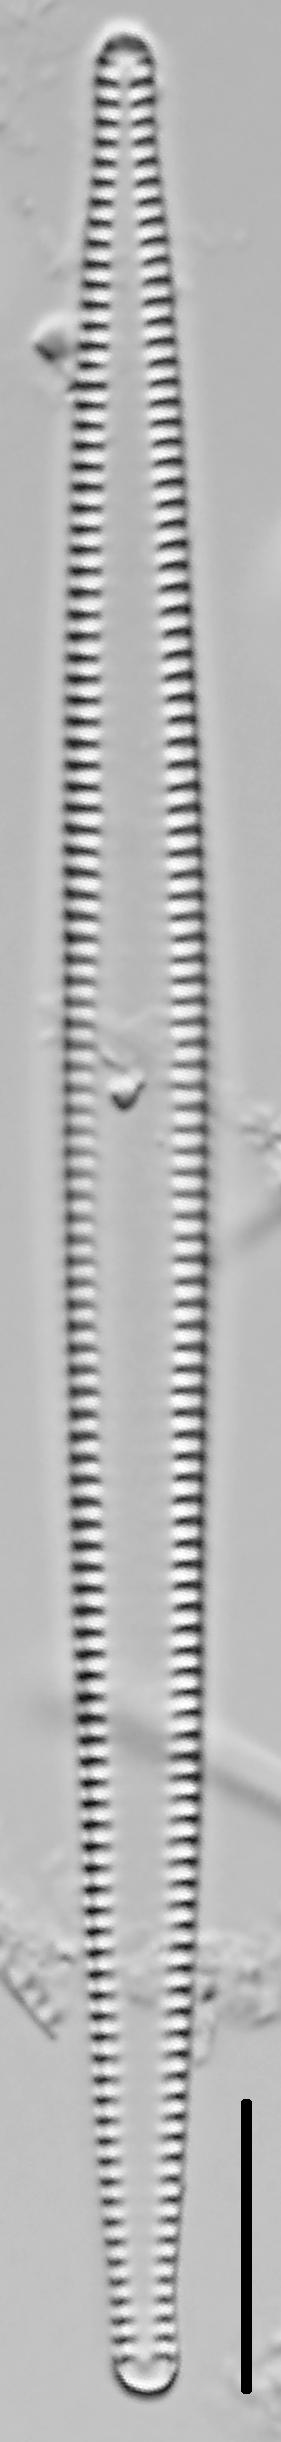 Tabularia fasciculata LM3